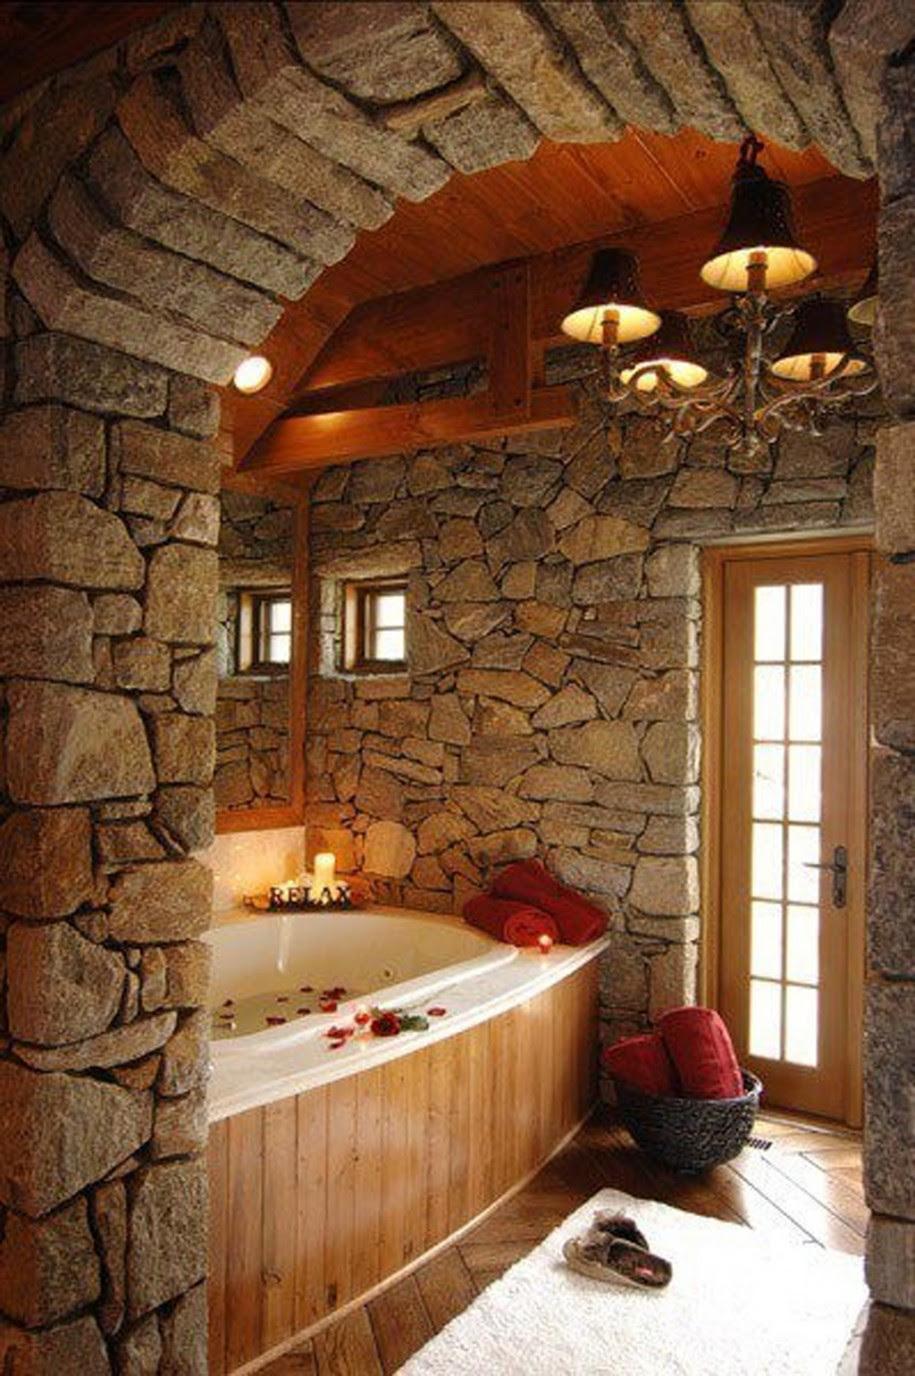 25 Rustic Bathroom Design Ideas - Decoration Love